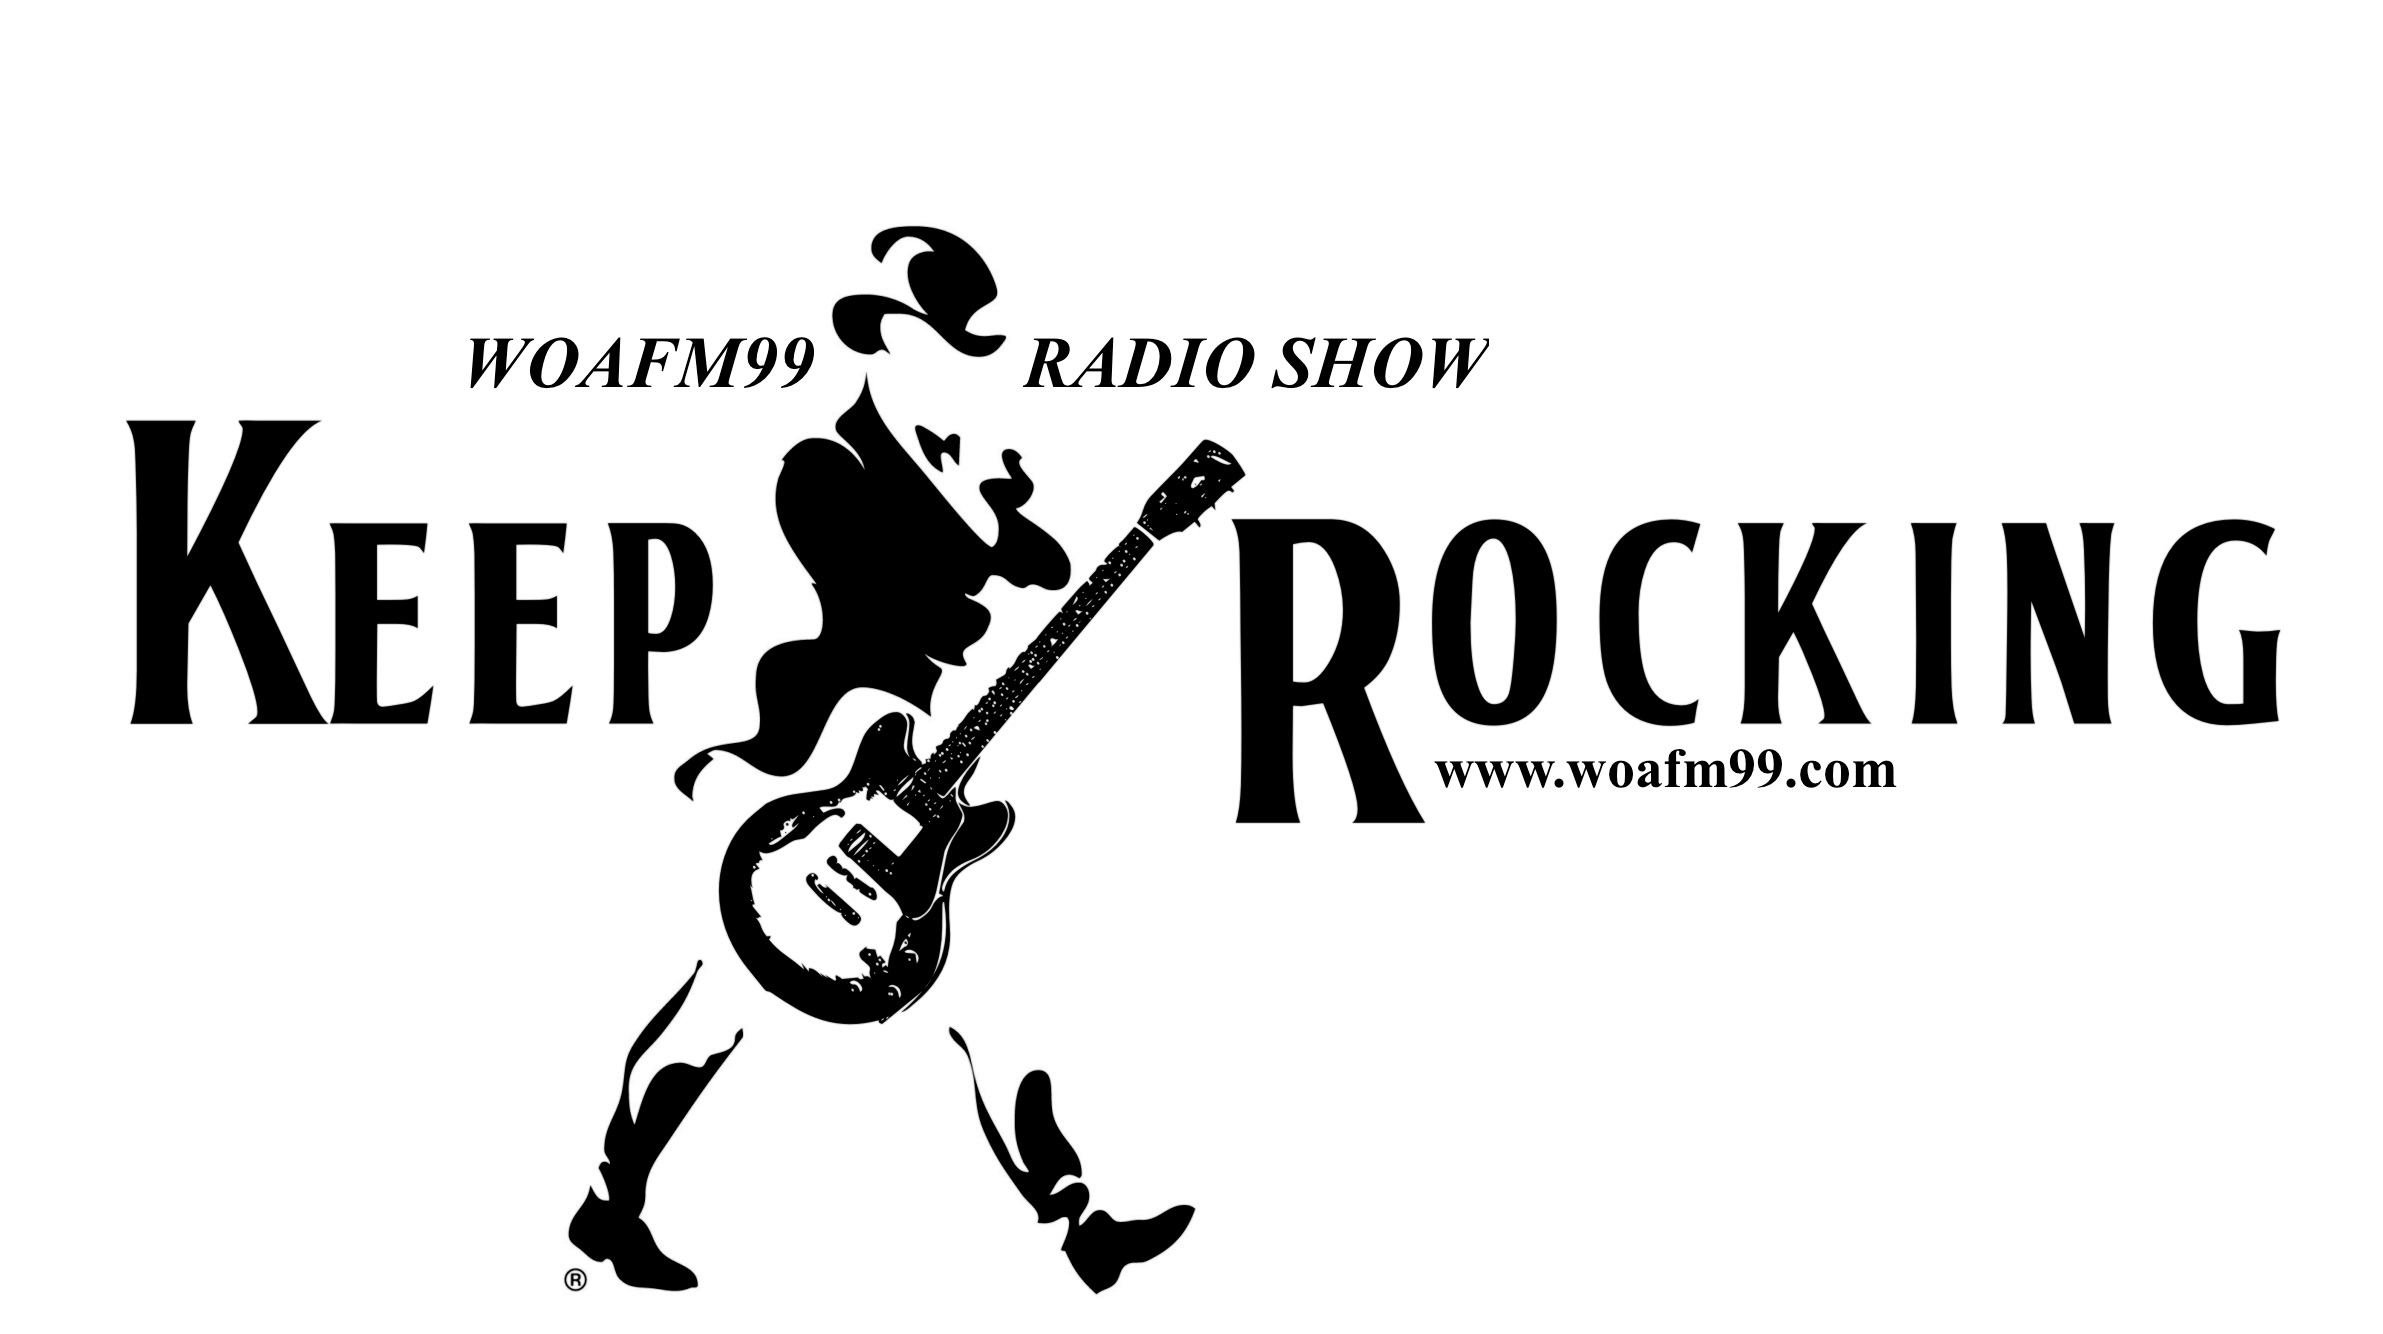 KEEPIN IT ROCKIN- WOAFM99 Radio Show (Episode 5 / Season 12)